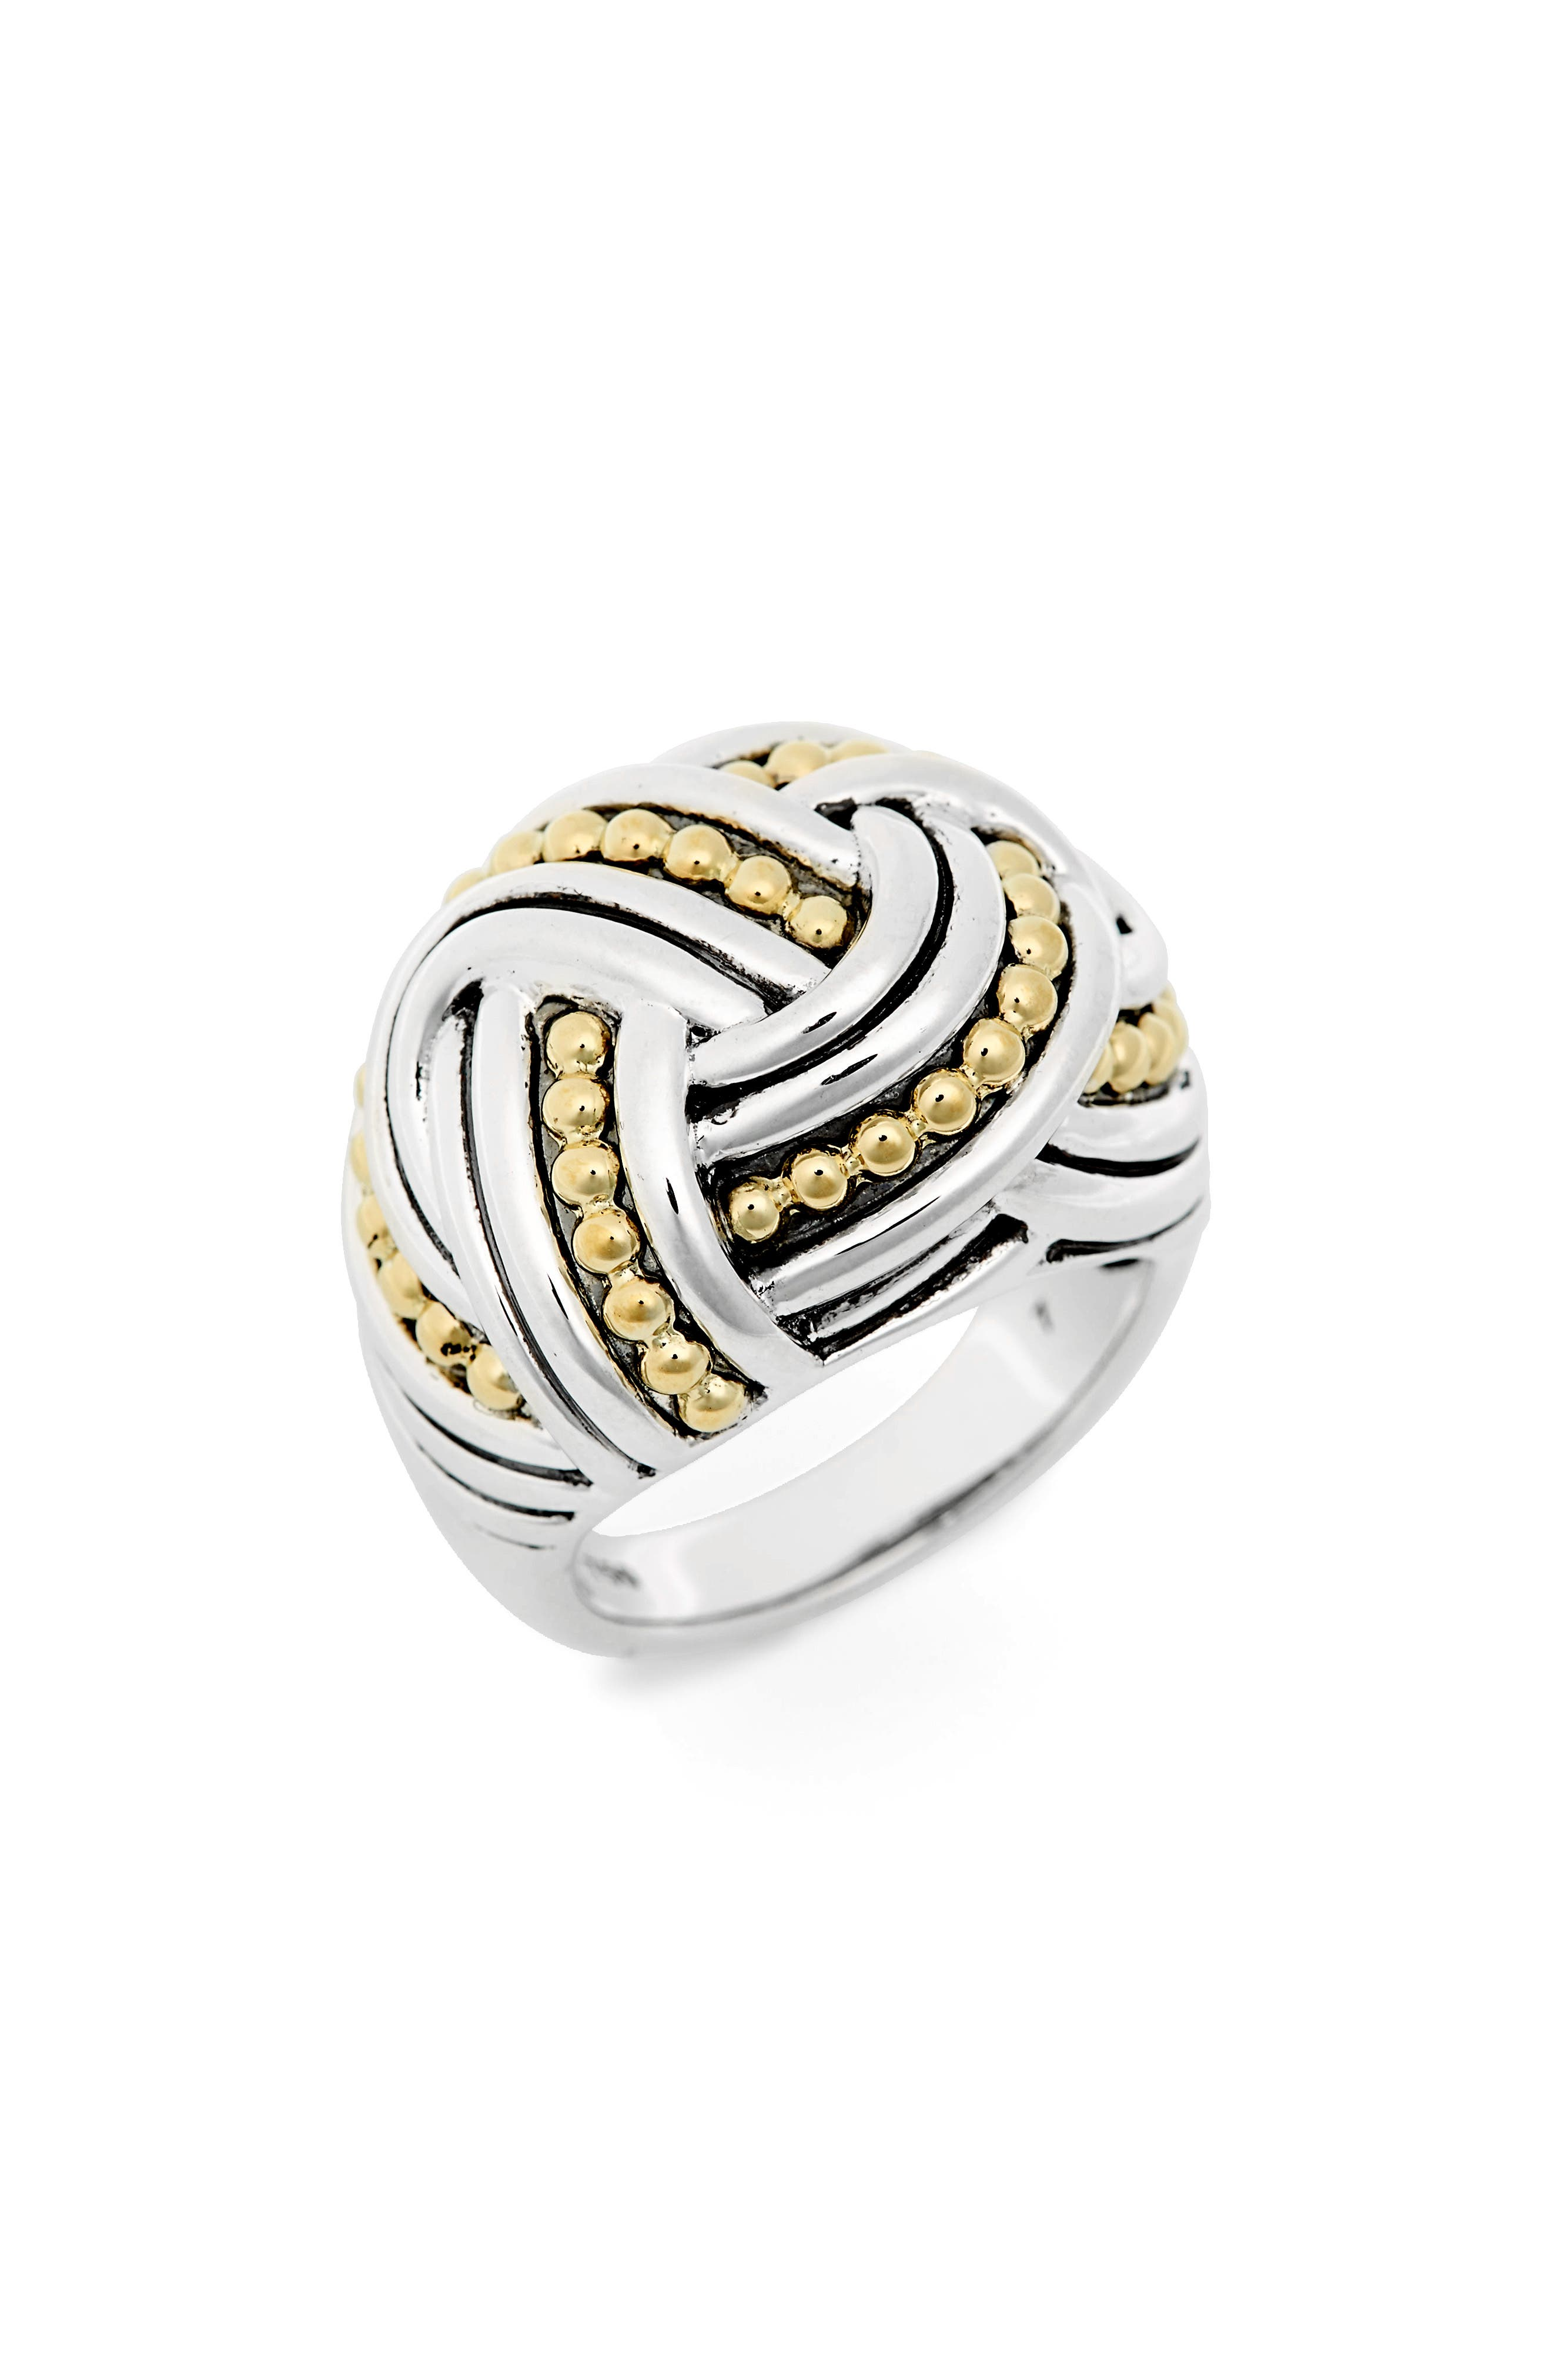 Main Image - LAGOS Torsade Large Rounded Rectangle Ring